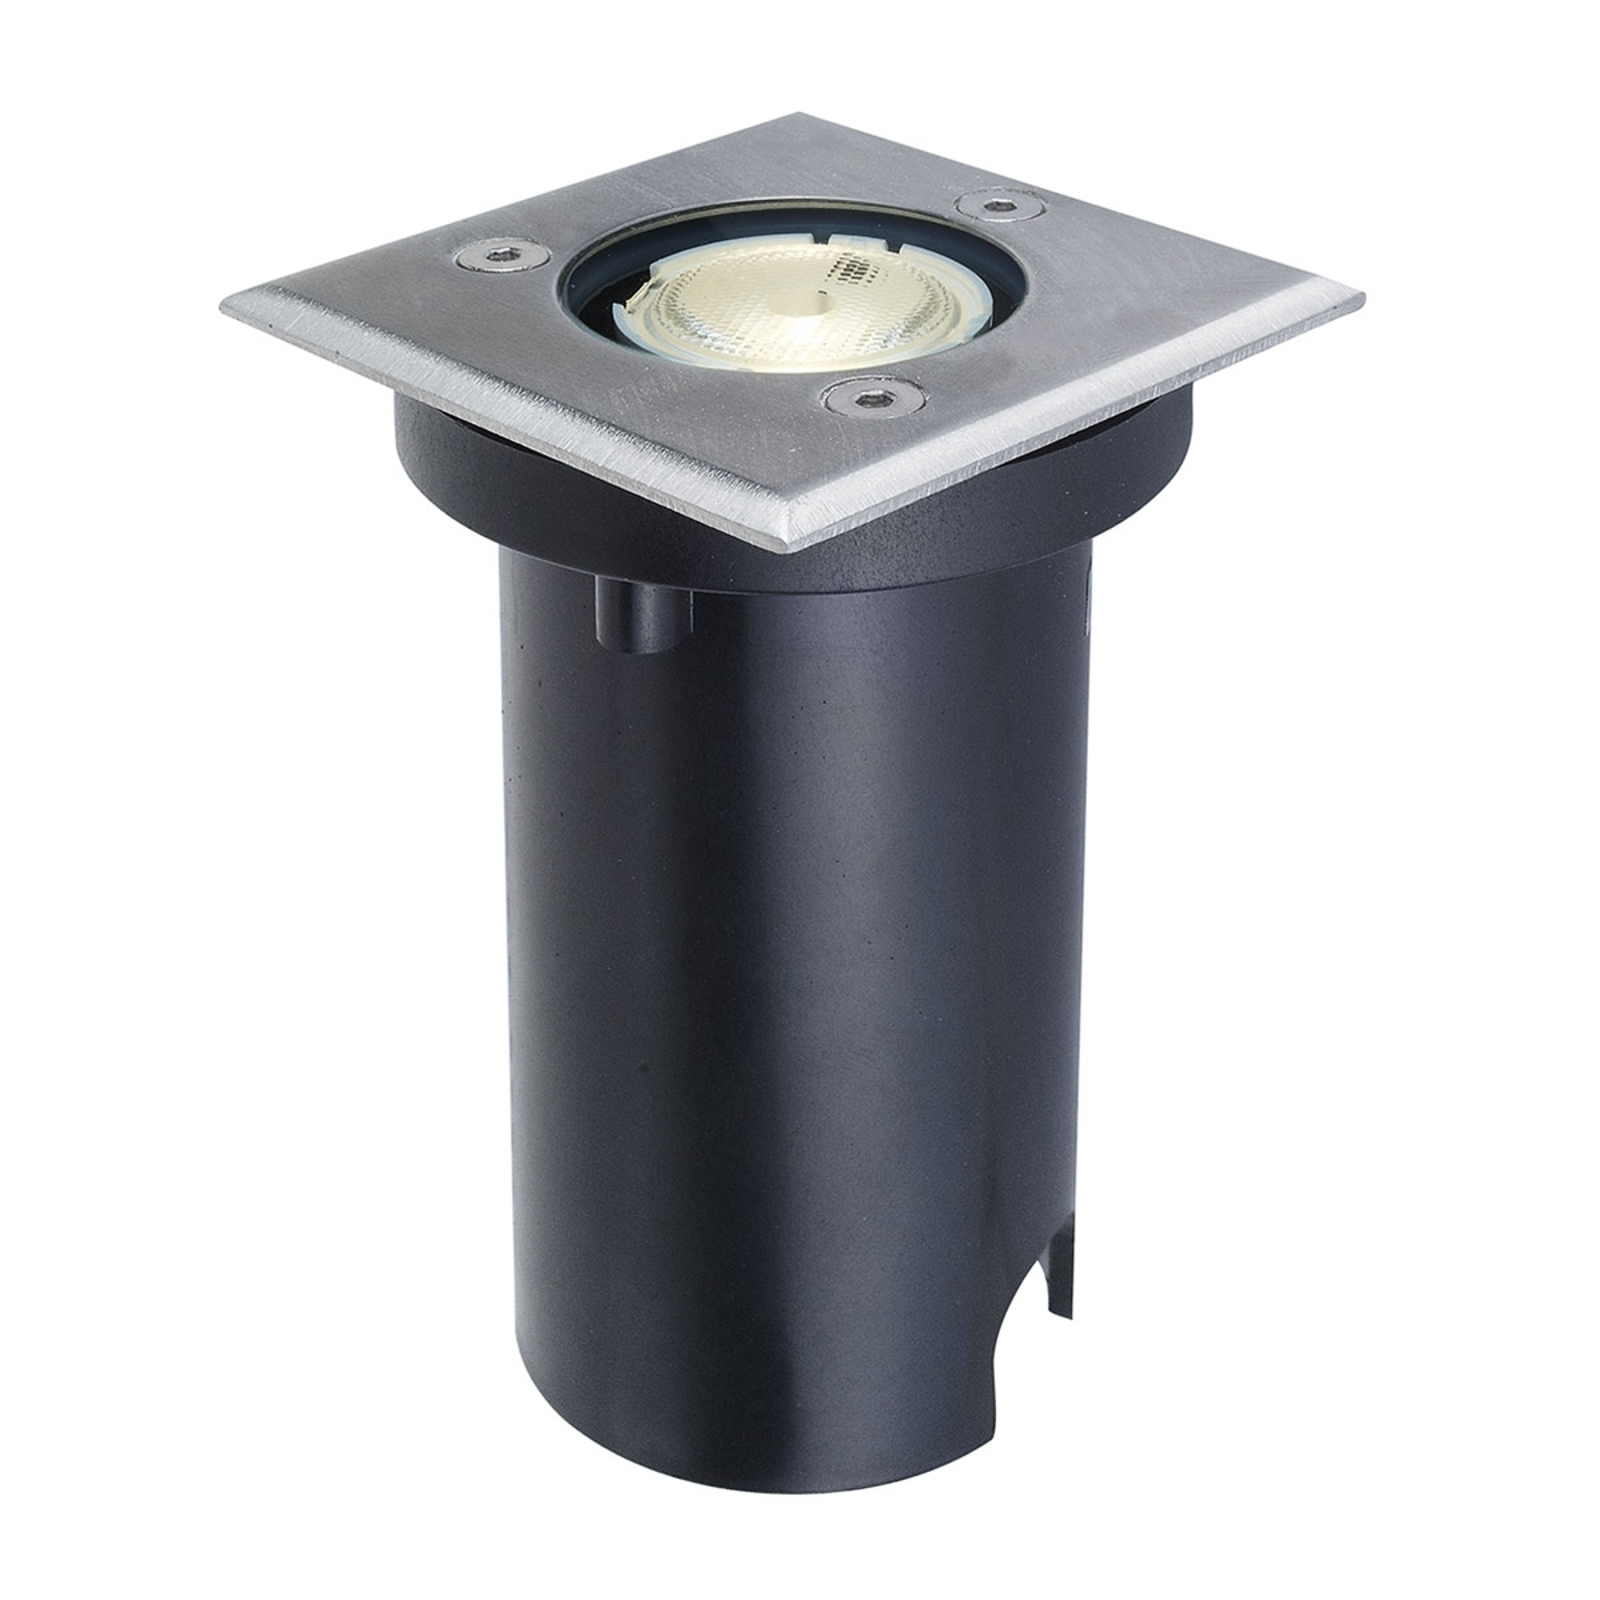 LED downlight i jord Kenan IP67 49 lm